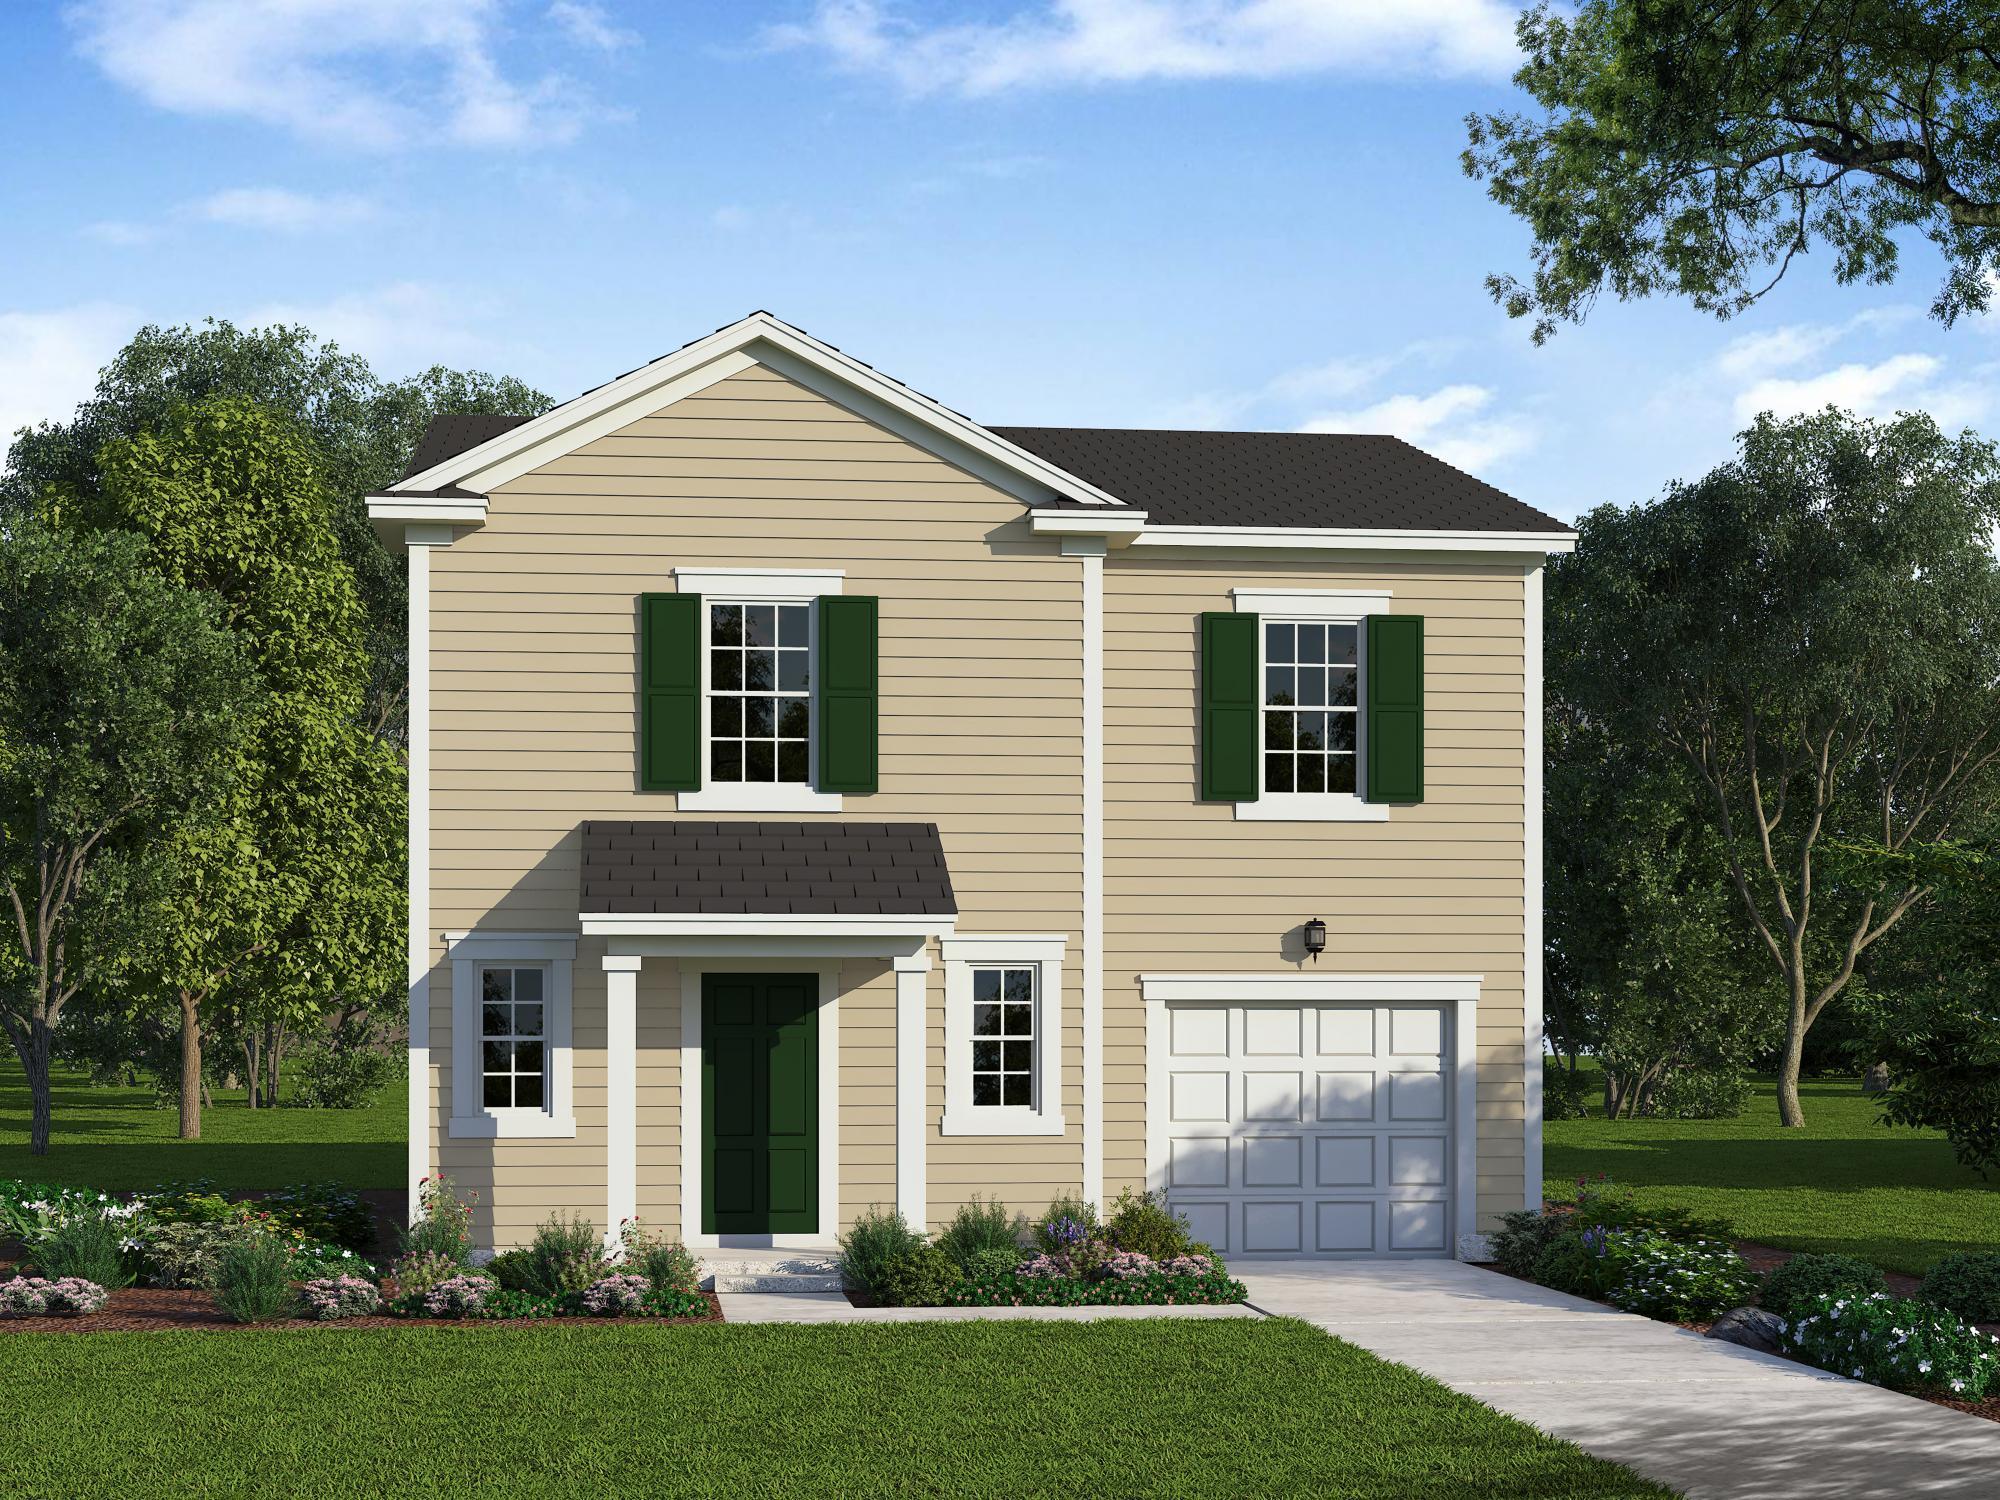 Freelance Plan, Spring Lake, NC 28390 - 3 Bed, 3 Bath Single-Family Home |  Trulia